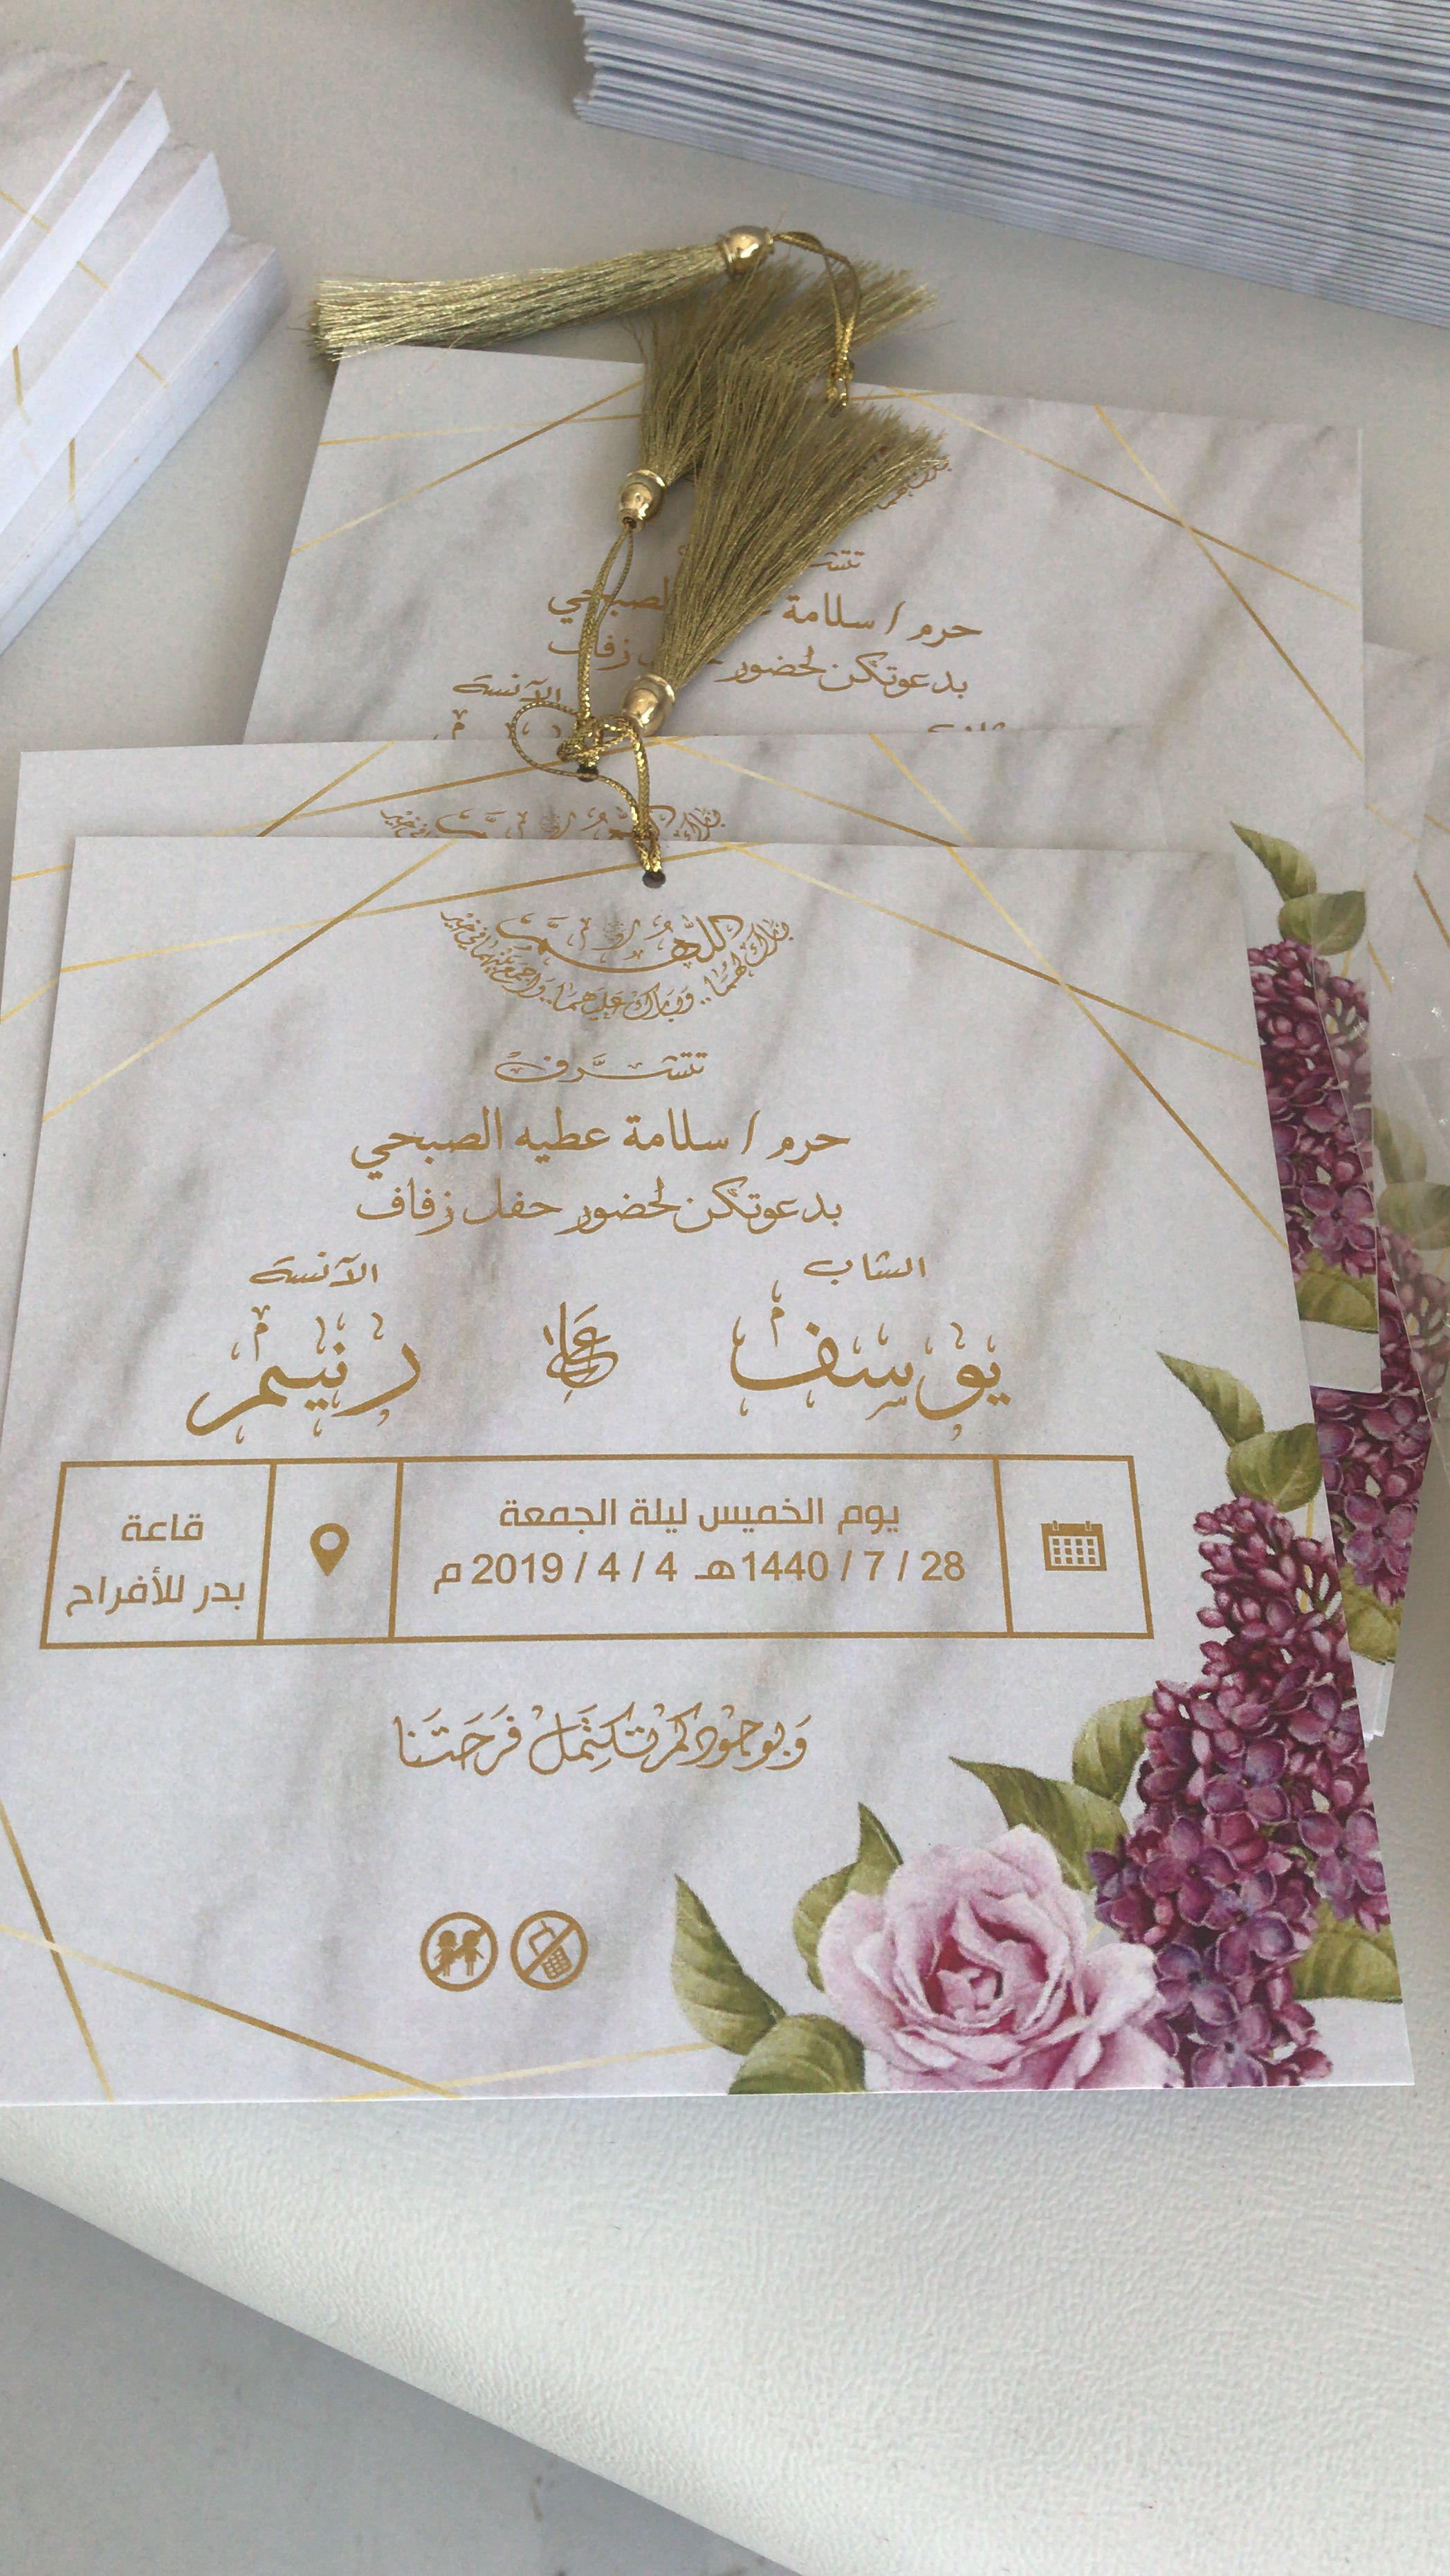 Pin By Lord Cards On Wedding Cards كروت افراح بطاقات لورد إنستغرام Lordcard Wedding Invitation Background Simple Wedding Invitation Card Wedding Invitation Video